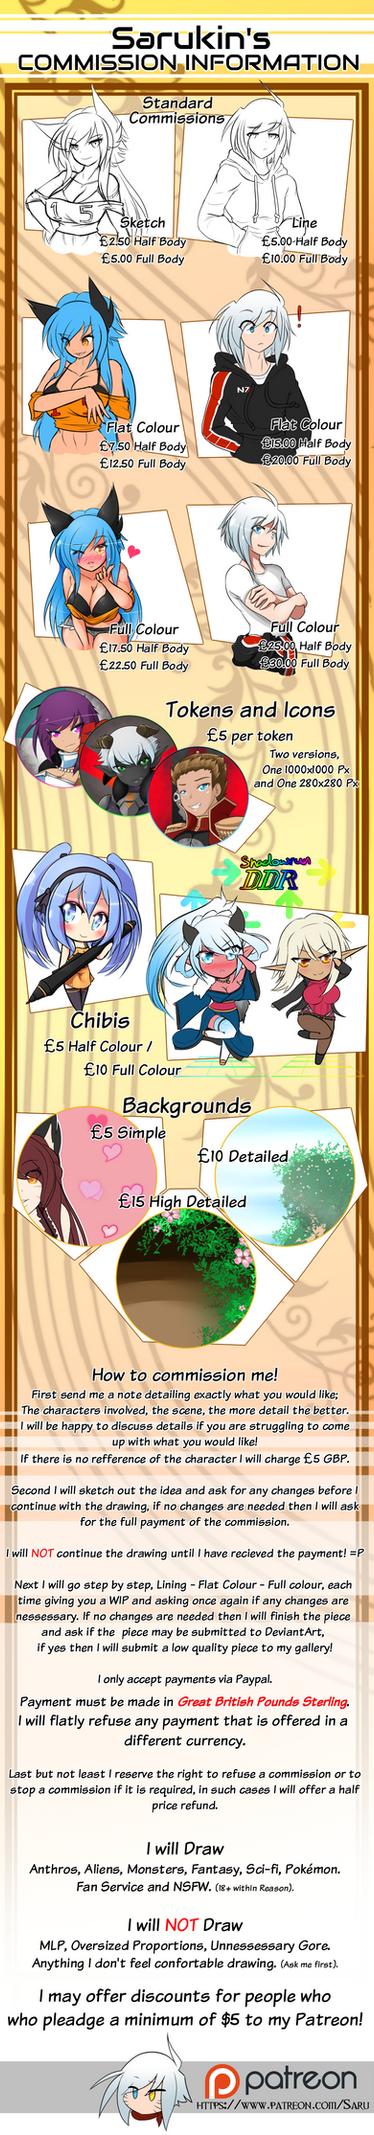 Saru's Commission Info by Sarukin